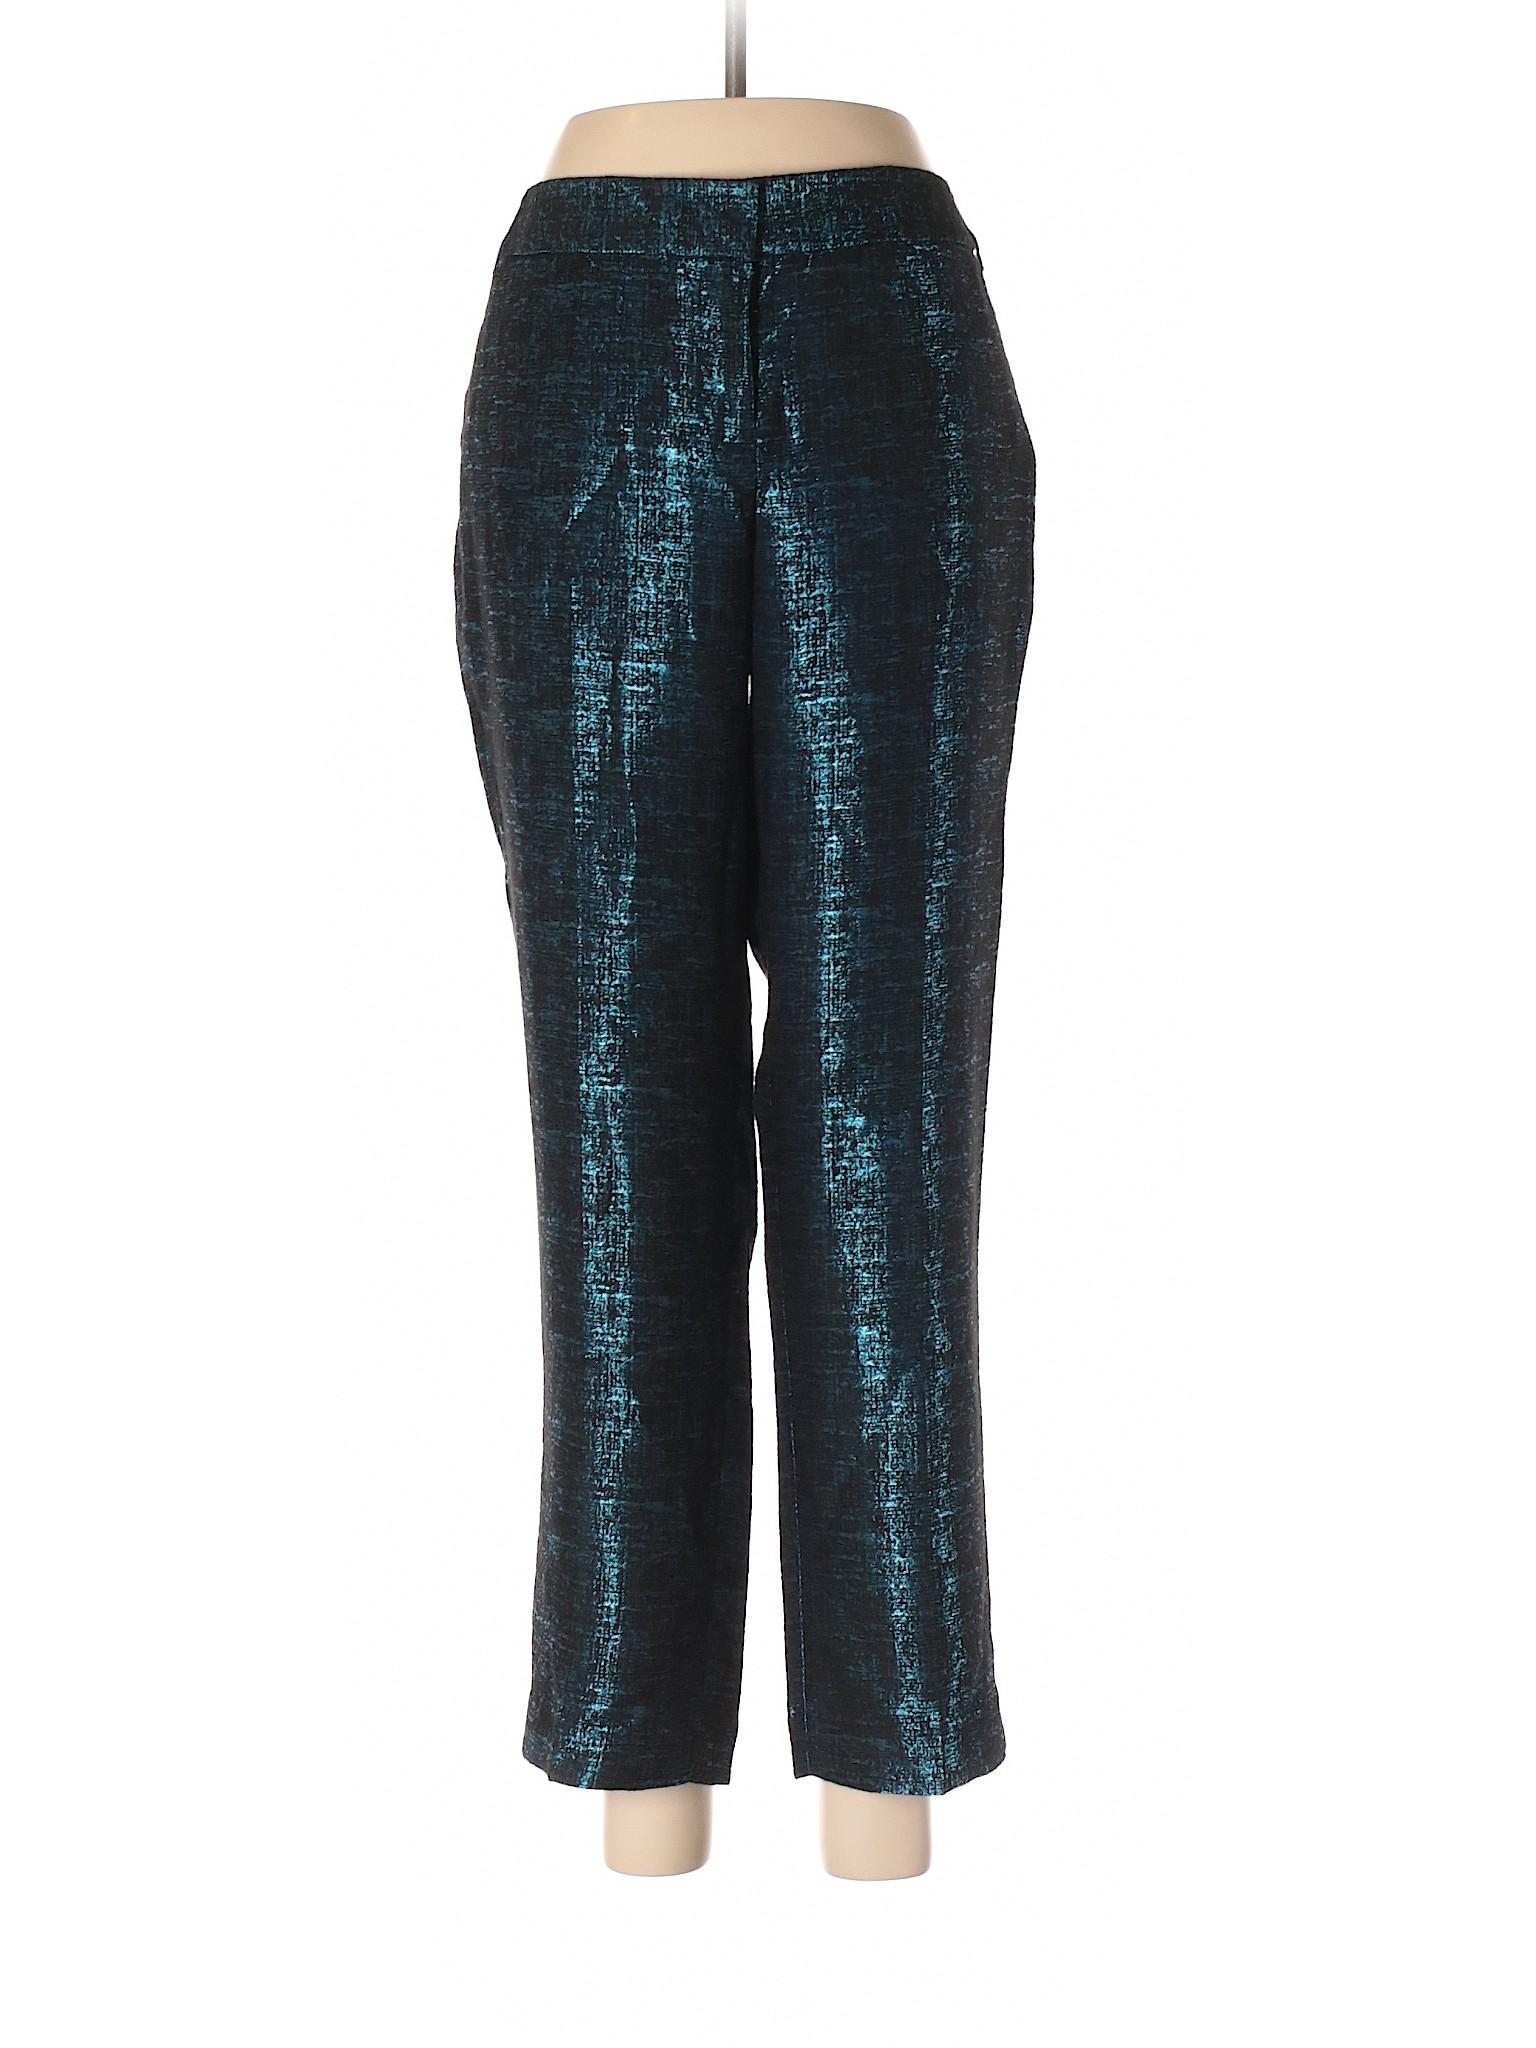 Dress Pants leisure Boutique Dress Dress leisure Express Express Boutique Pants Boutique leisure Express Pants XX78q0f